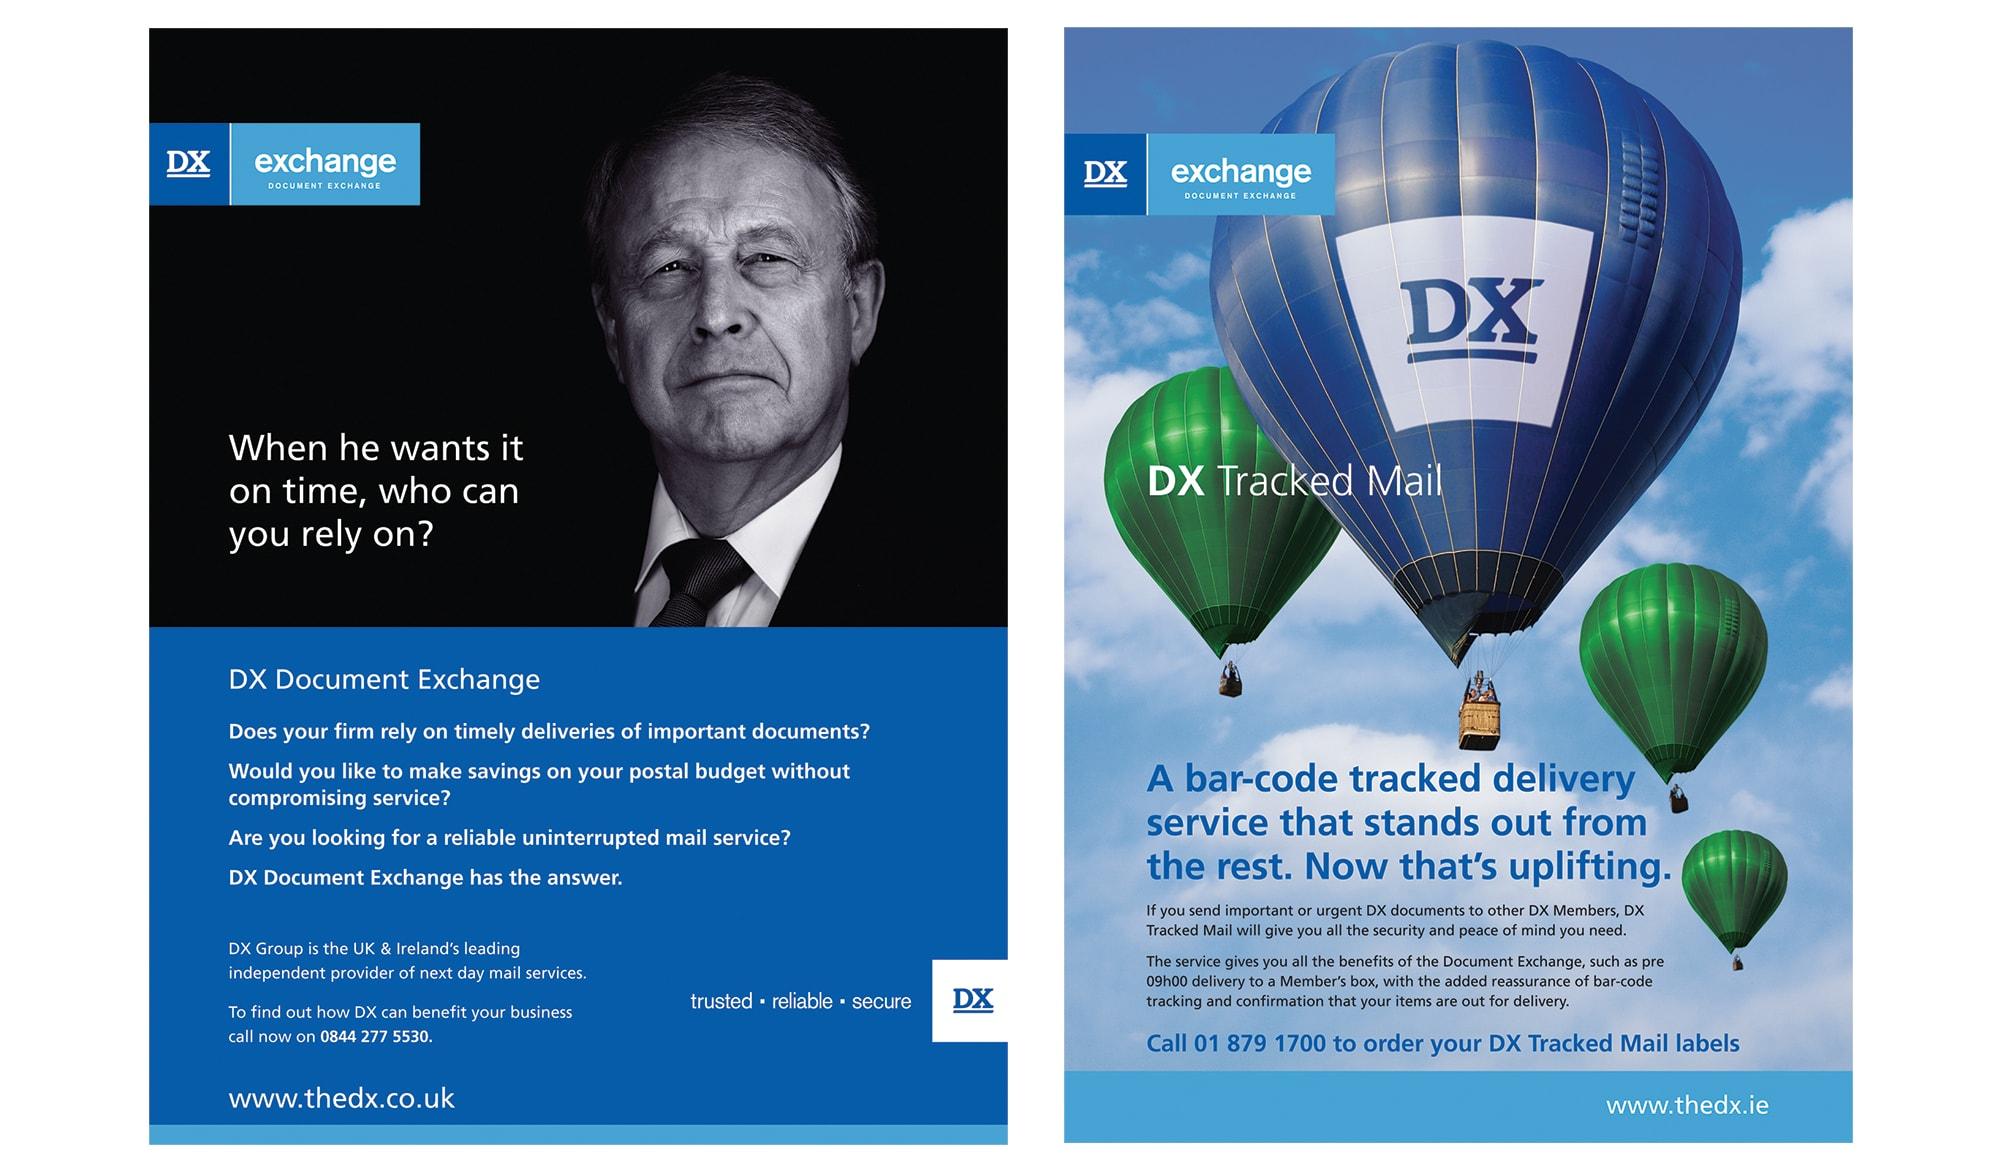 DX adverts